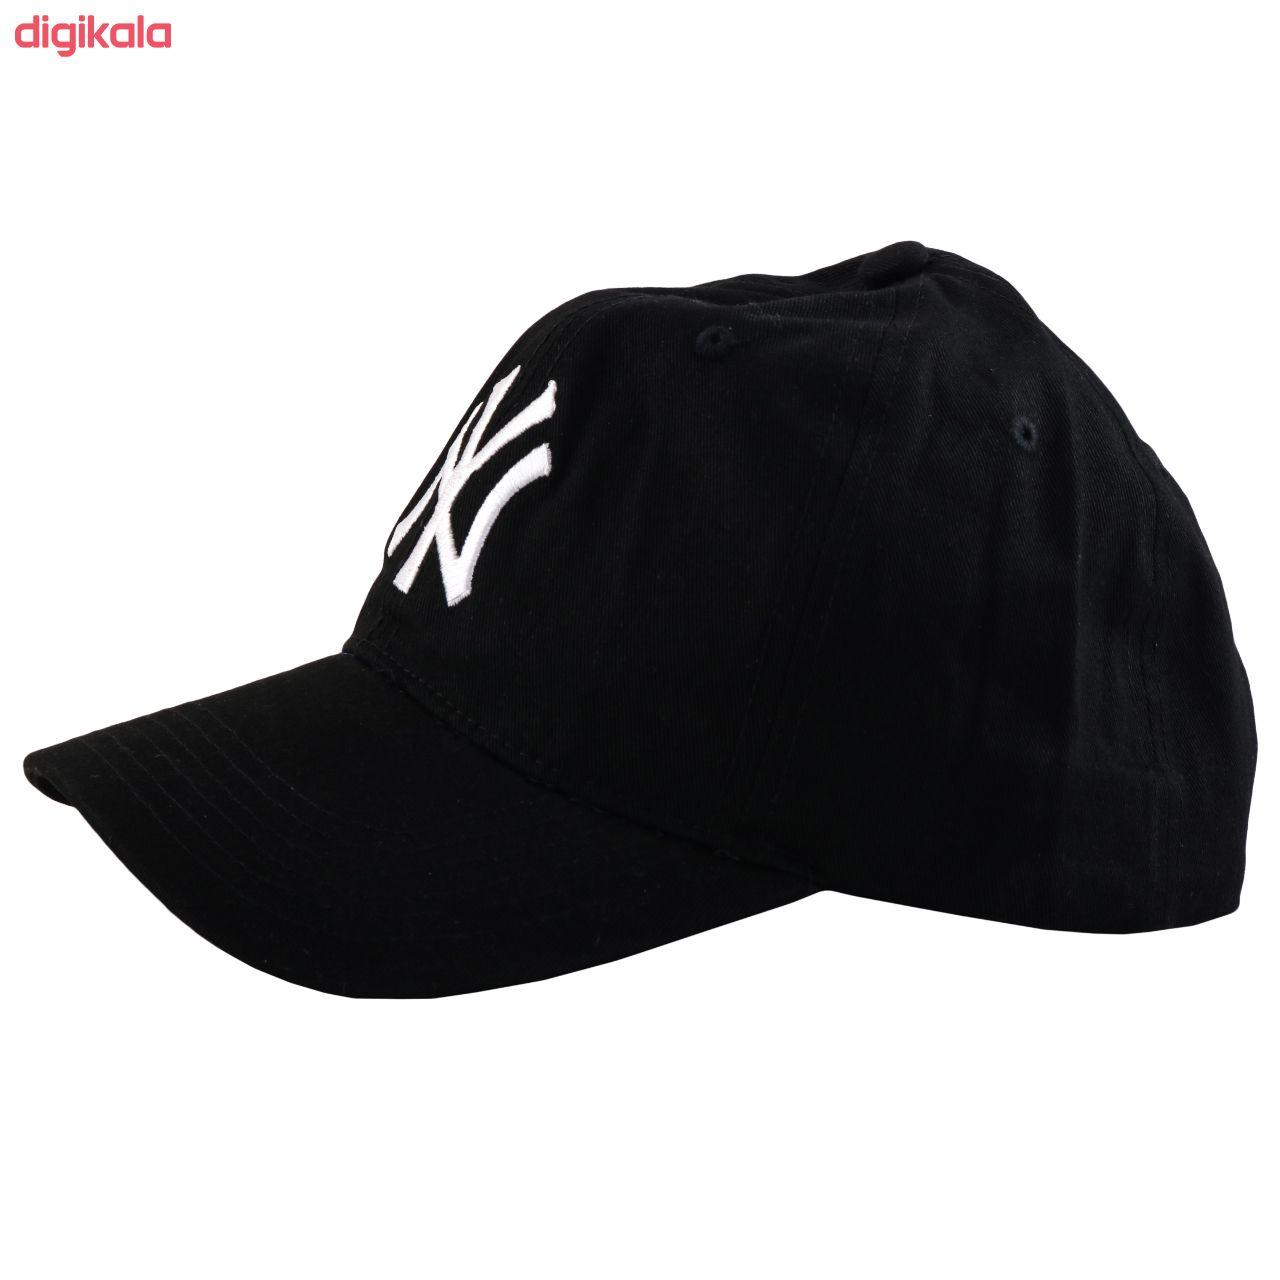 کلاه کپ طرح NY کد 4832 main 1 1